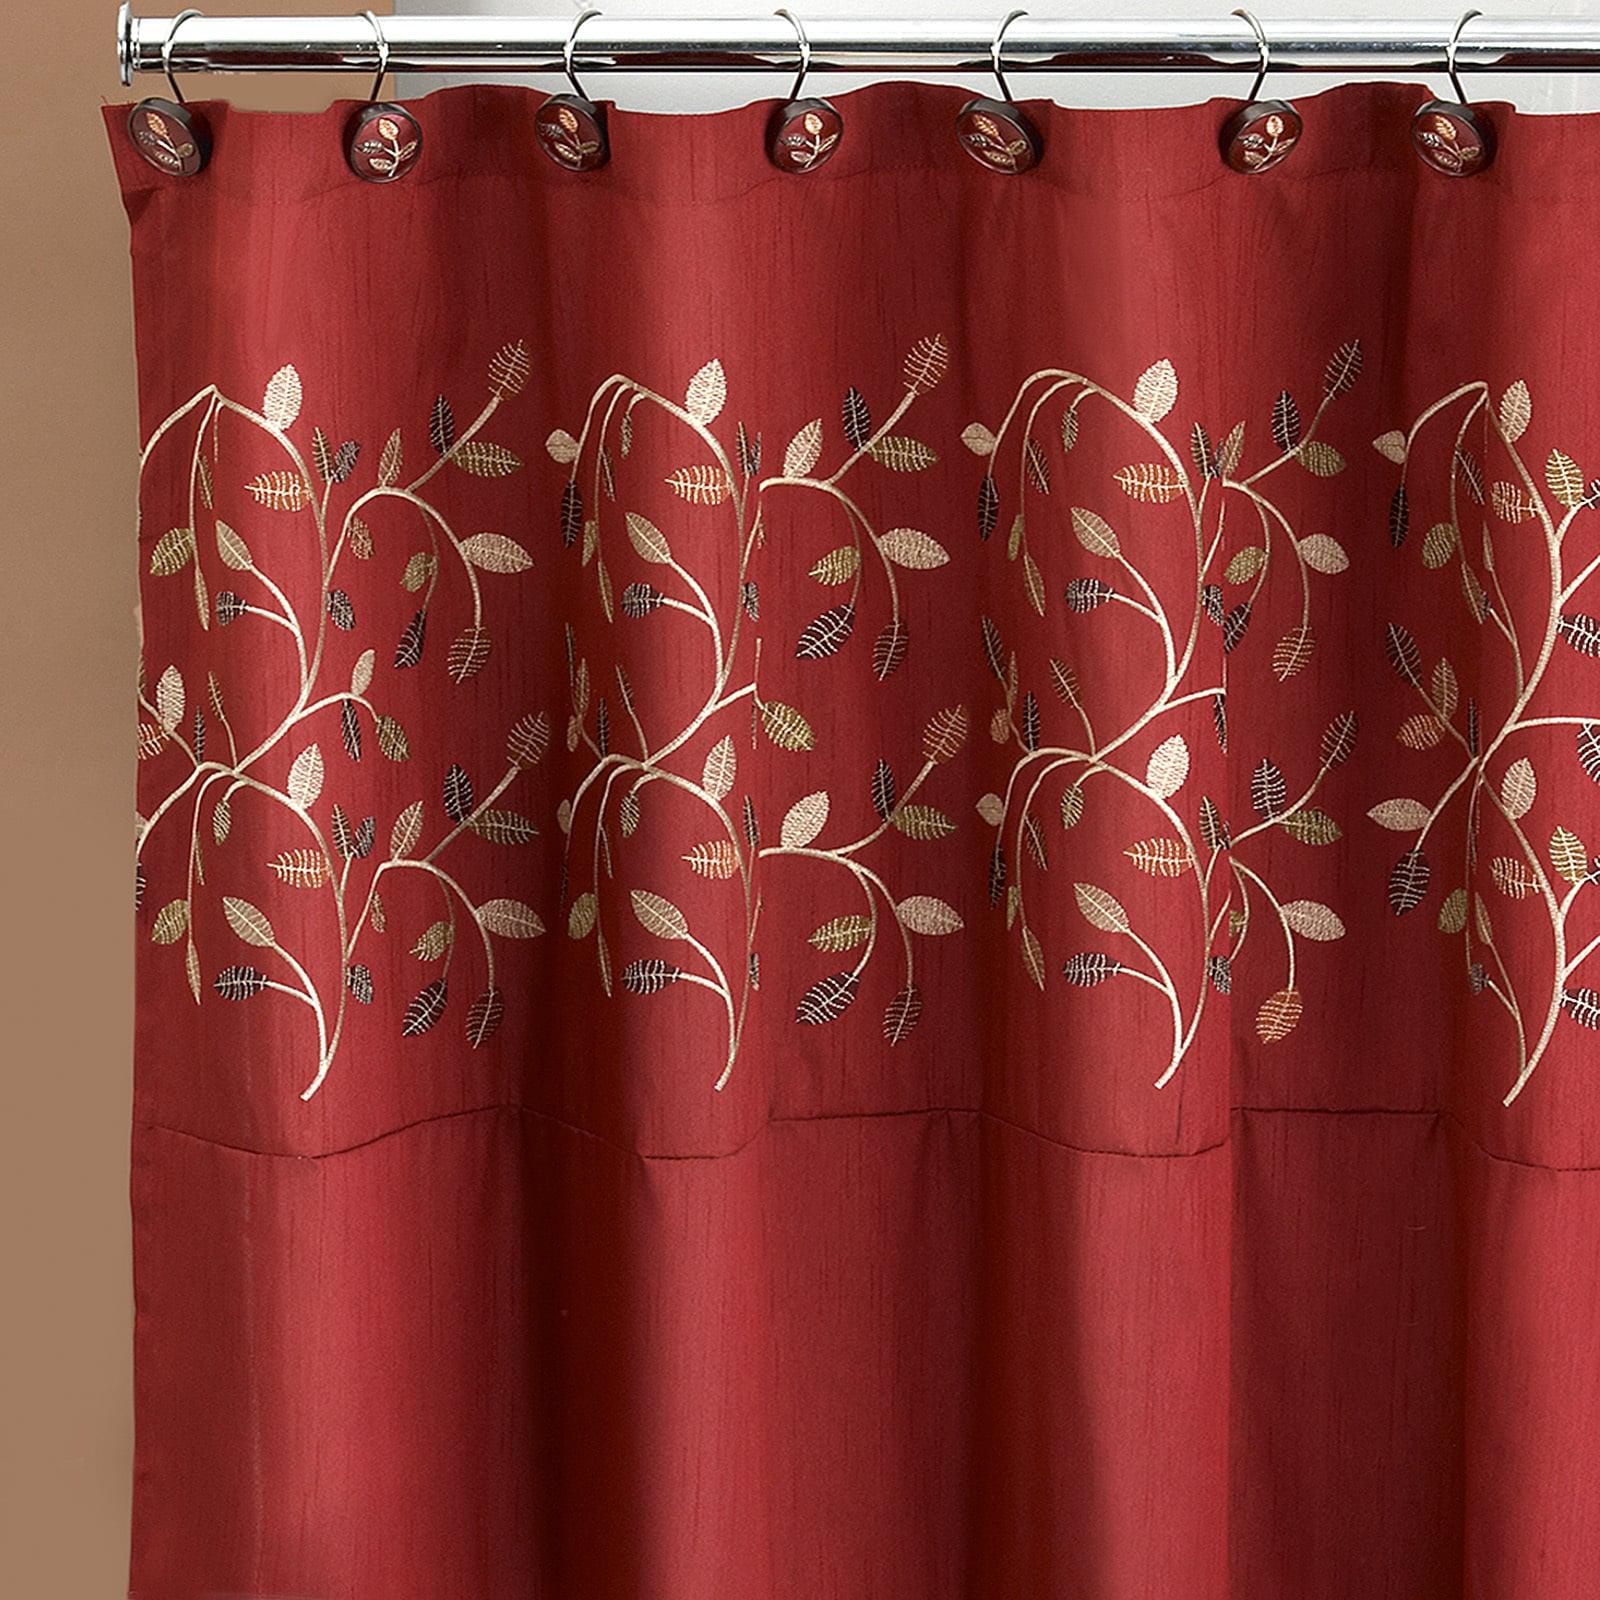 Shop Black Friday Deals On Burgundy Embroidered Leaf Pattern Shower Curtain And Hooks Set Or Separates Overstock 10763769